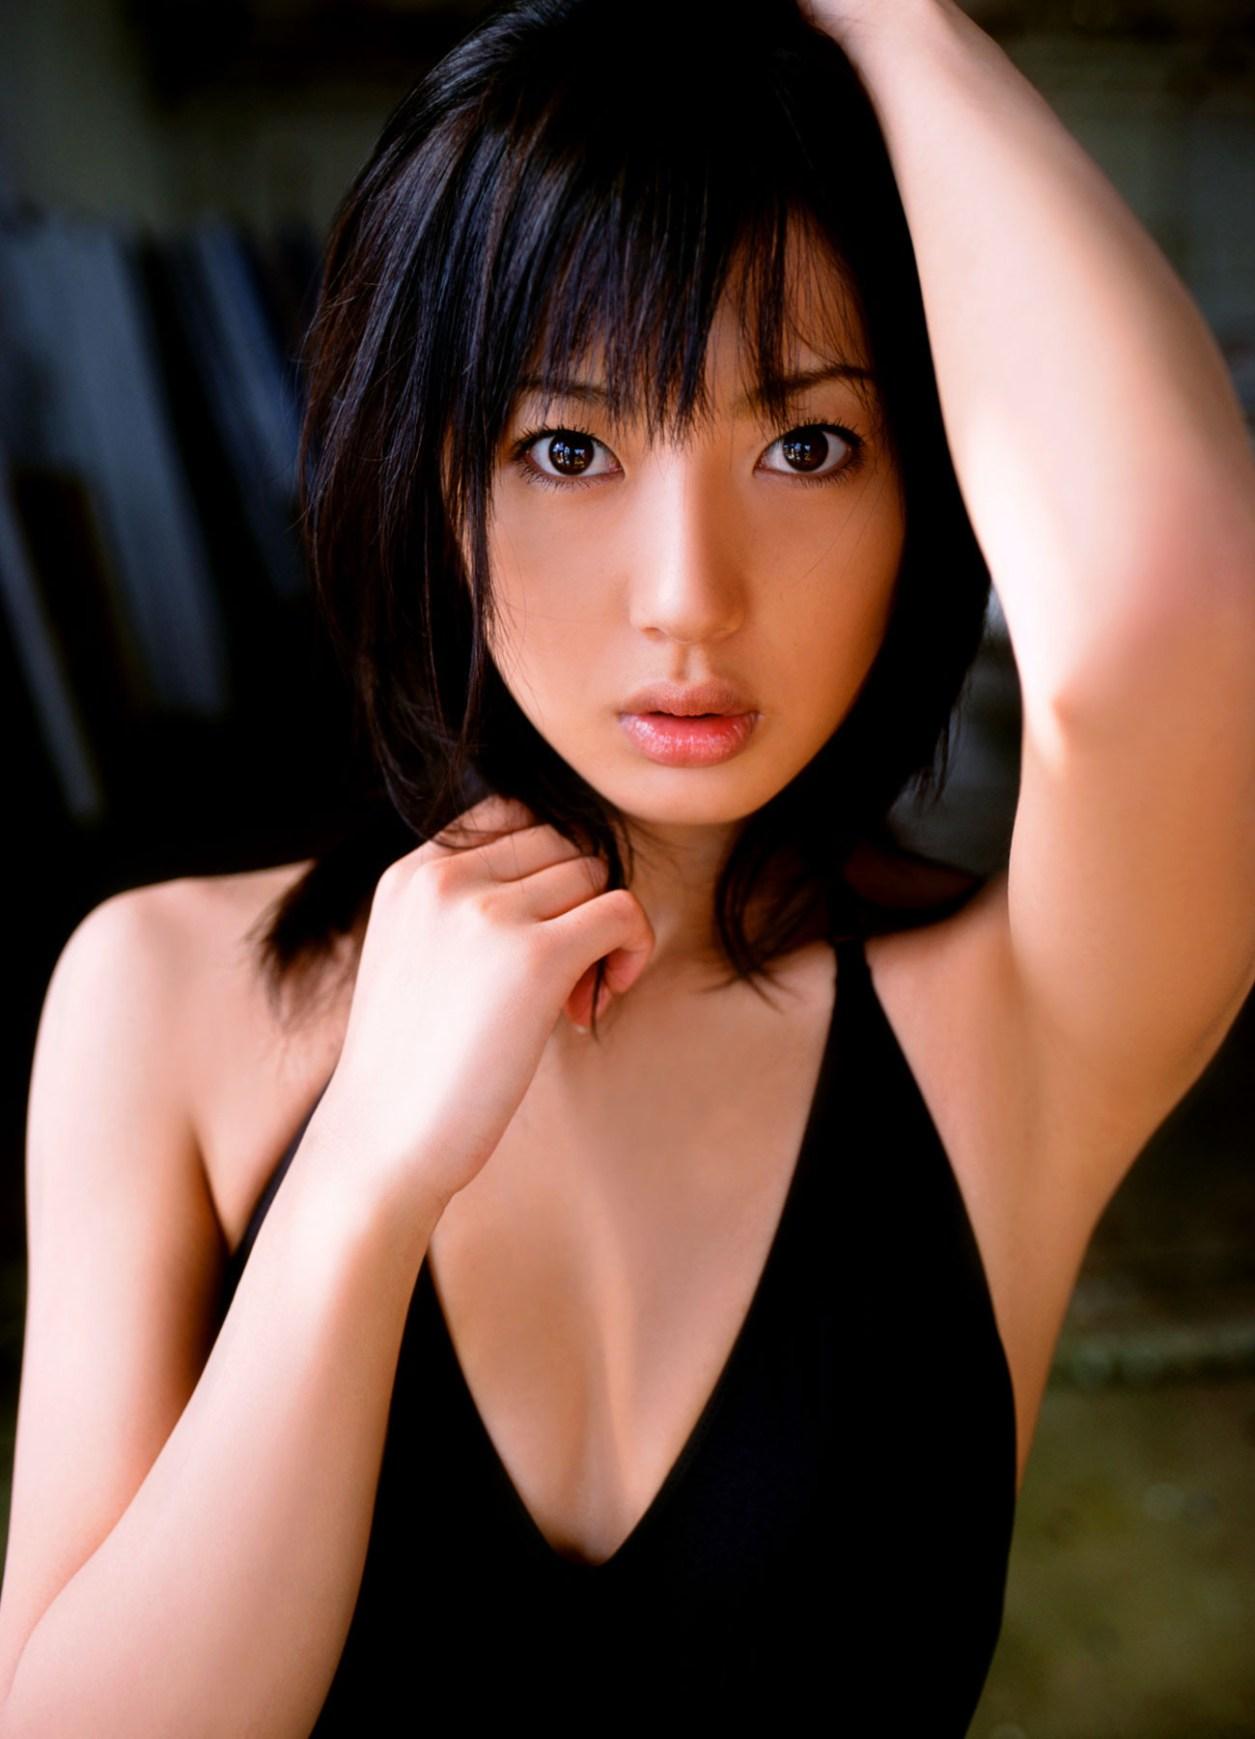 Ogura-Haruka-Light-My-Fire-001